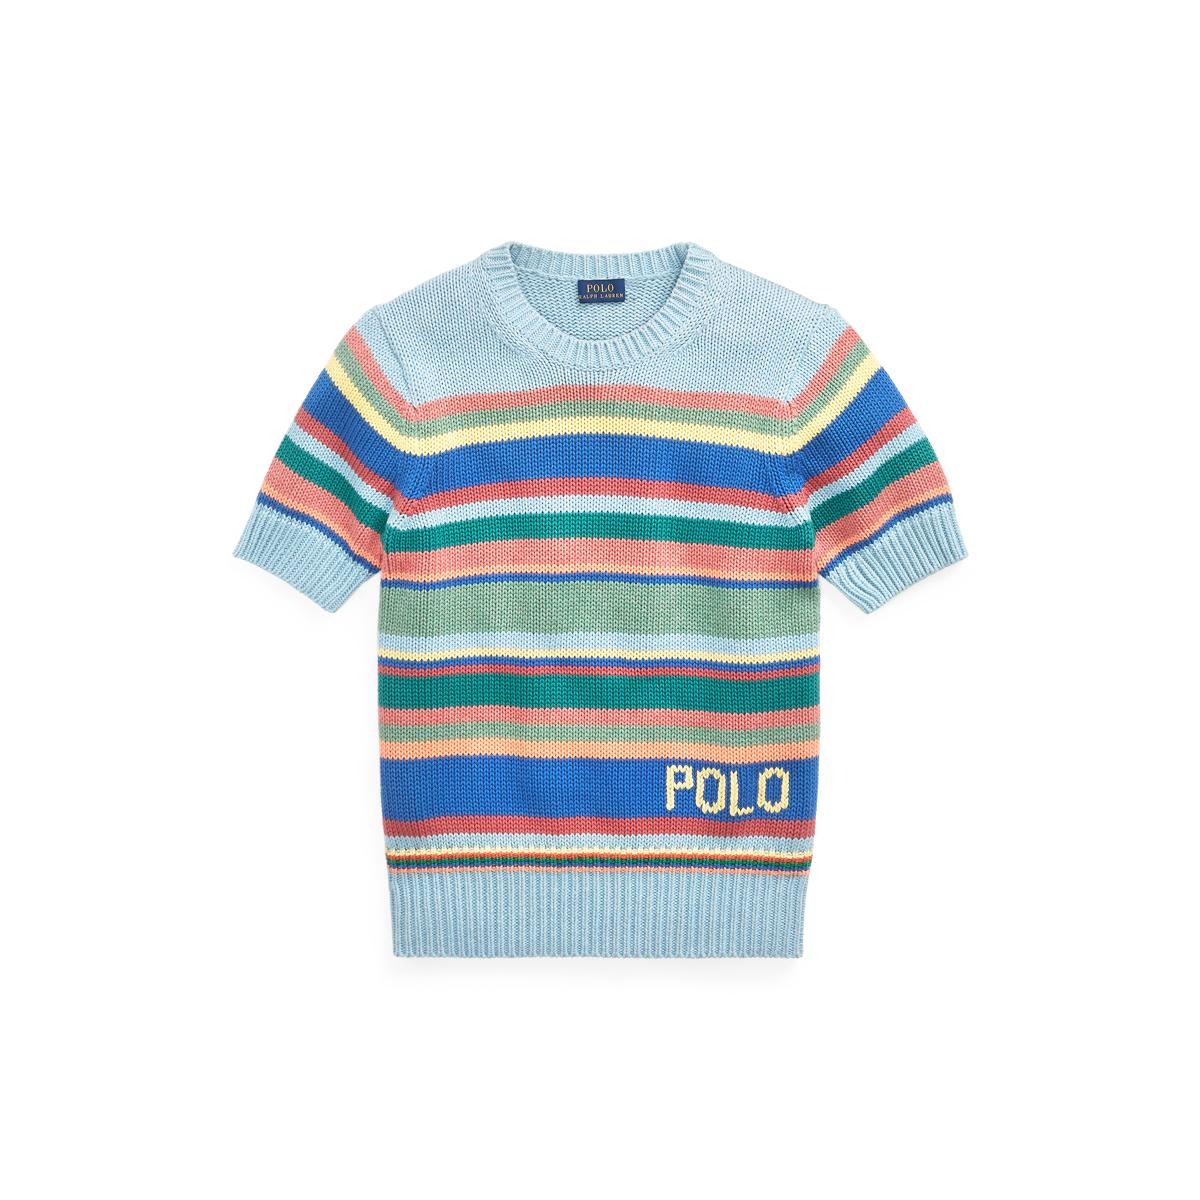 31e920584 Striped Short-Sleeve Sweater